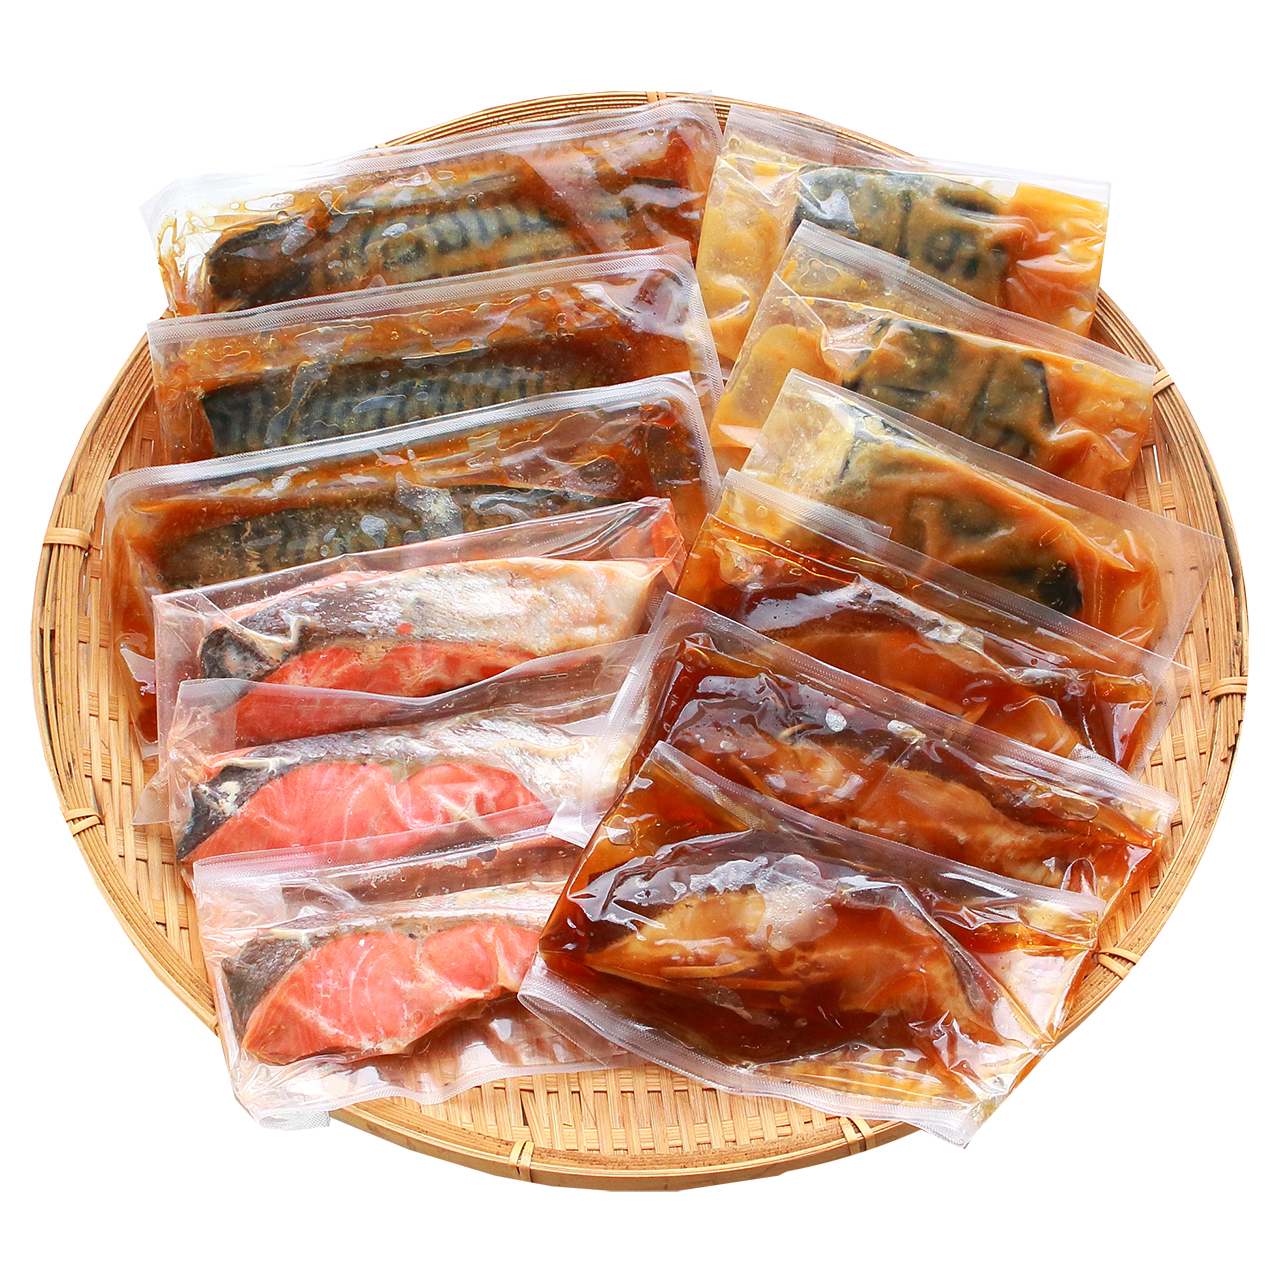 【敬老の日限定包装】氷温熟成 煮魚・焼魚詰合せ12切